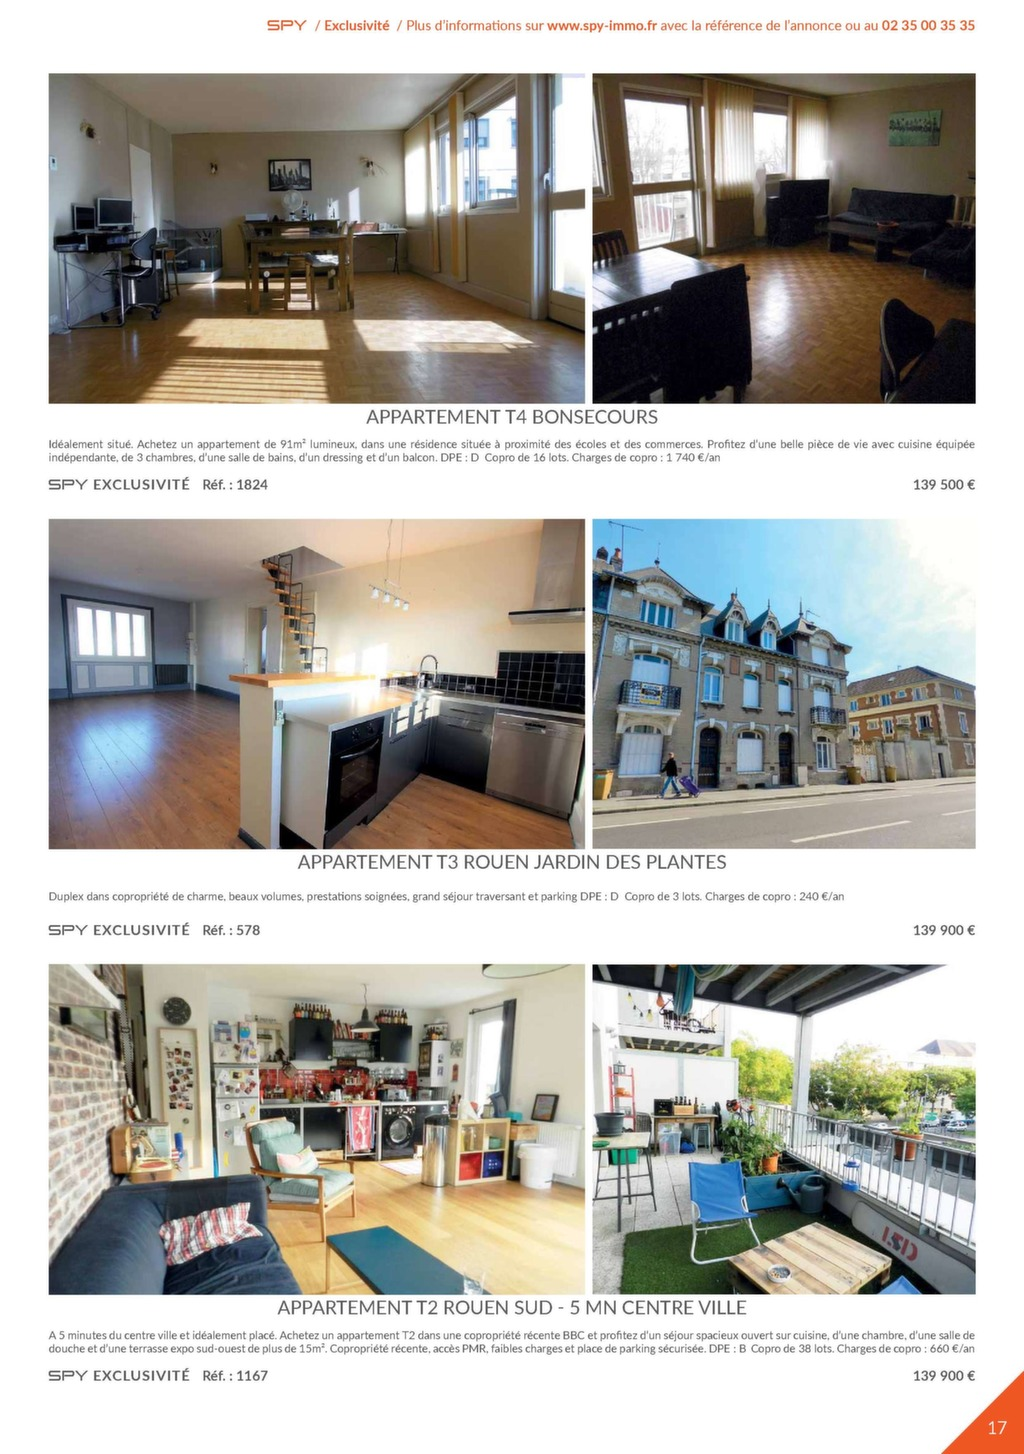 Salle De Bain Archi Expo ~ home rouen n 37 by spy magazine immo